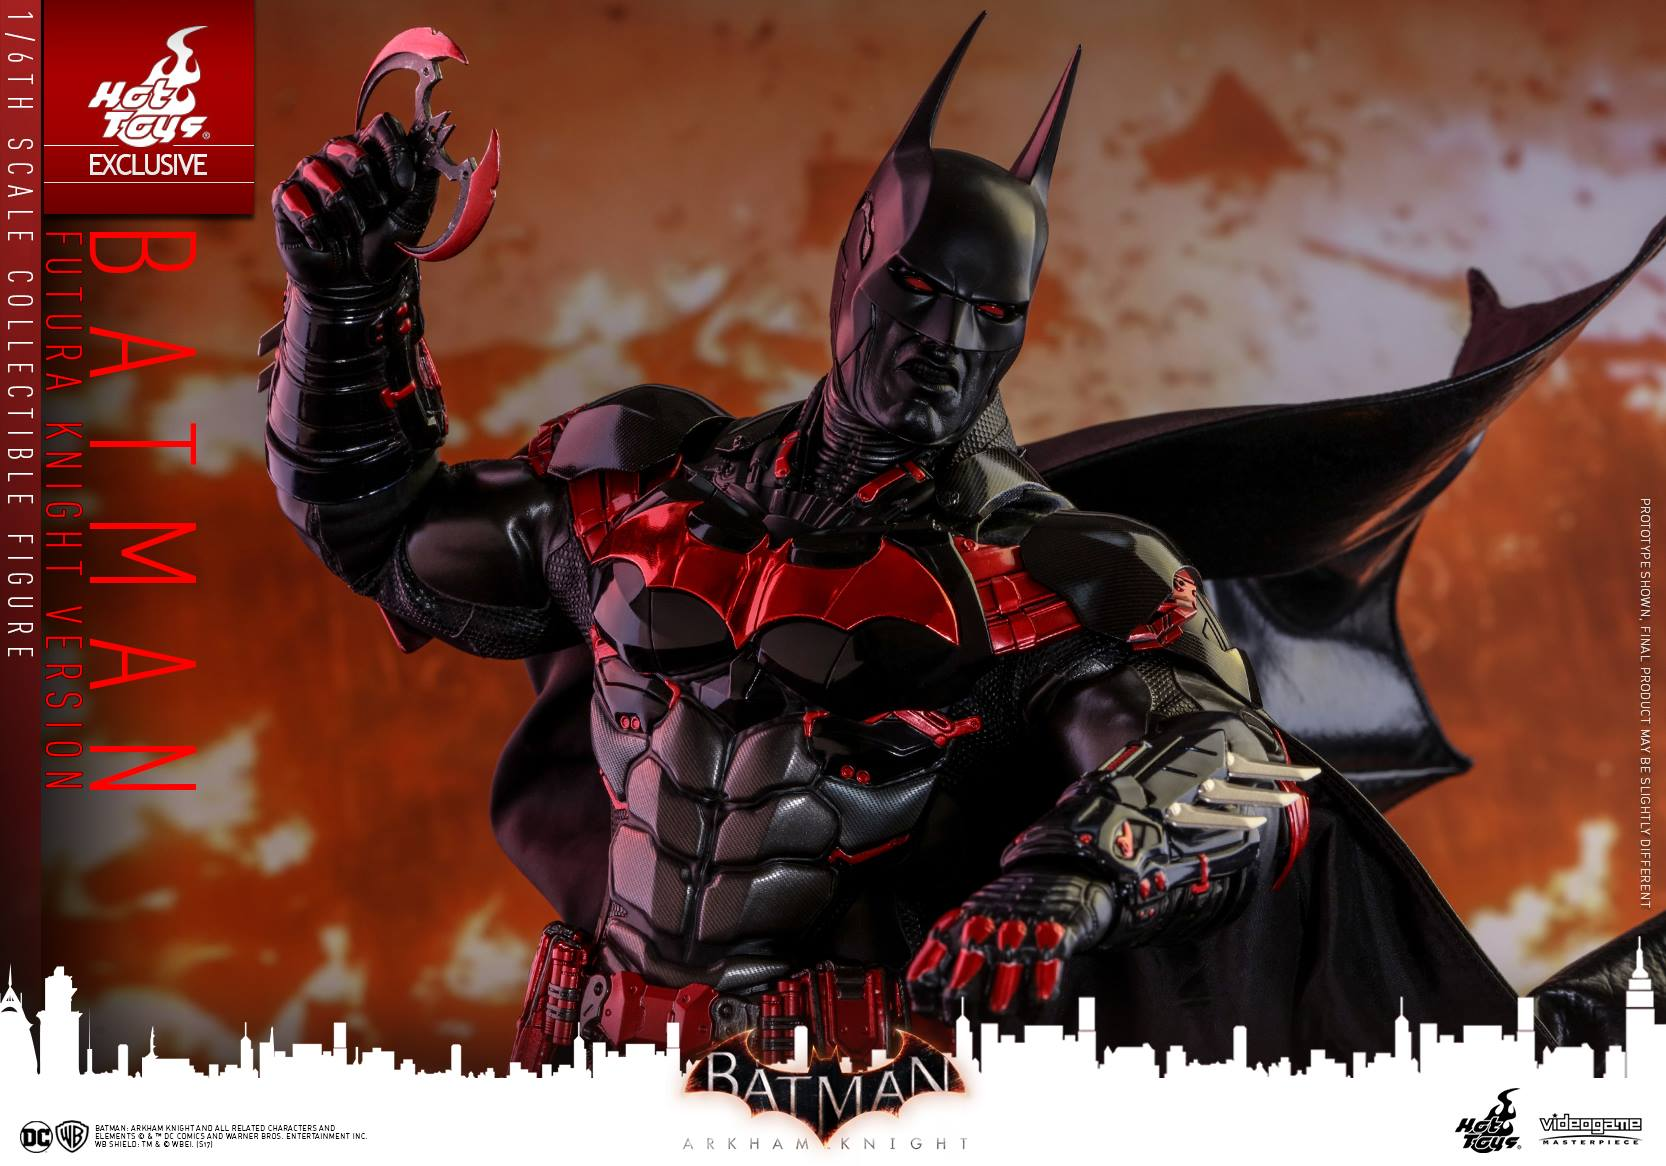 Hot Toys Batman: Arkham Knight – Batman Futura Version Sixth Scale Figure